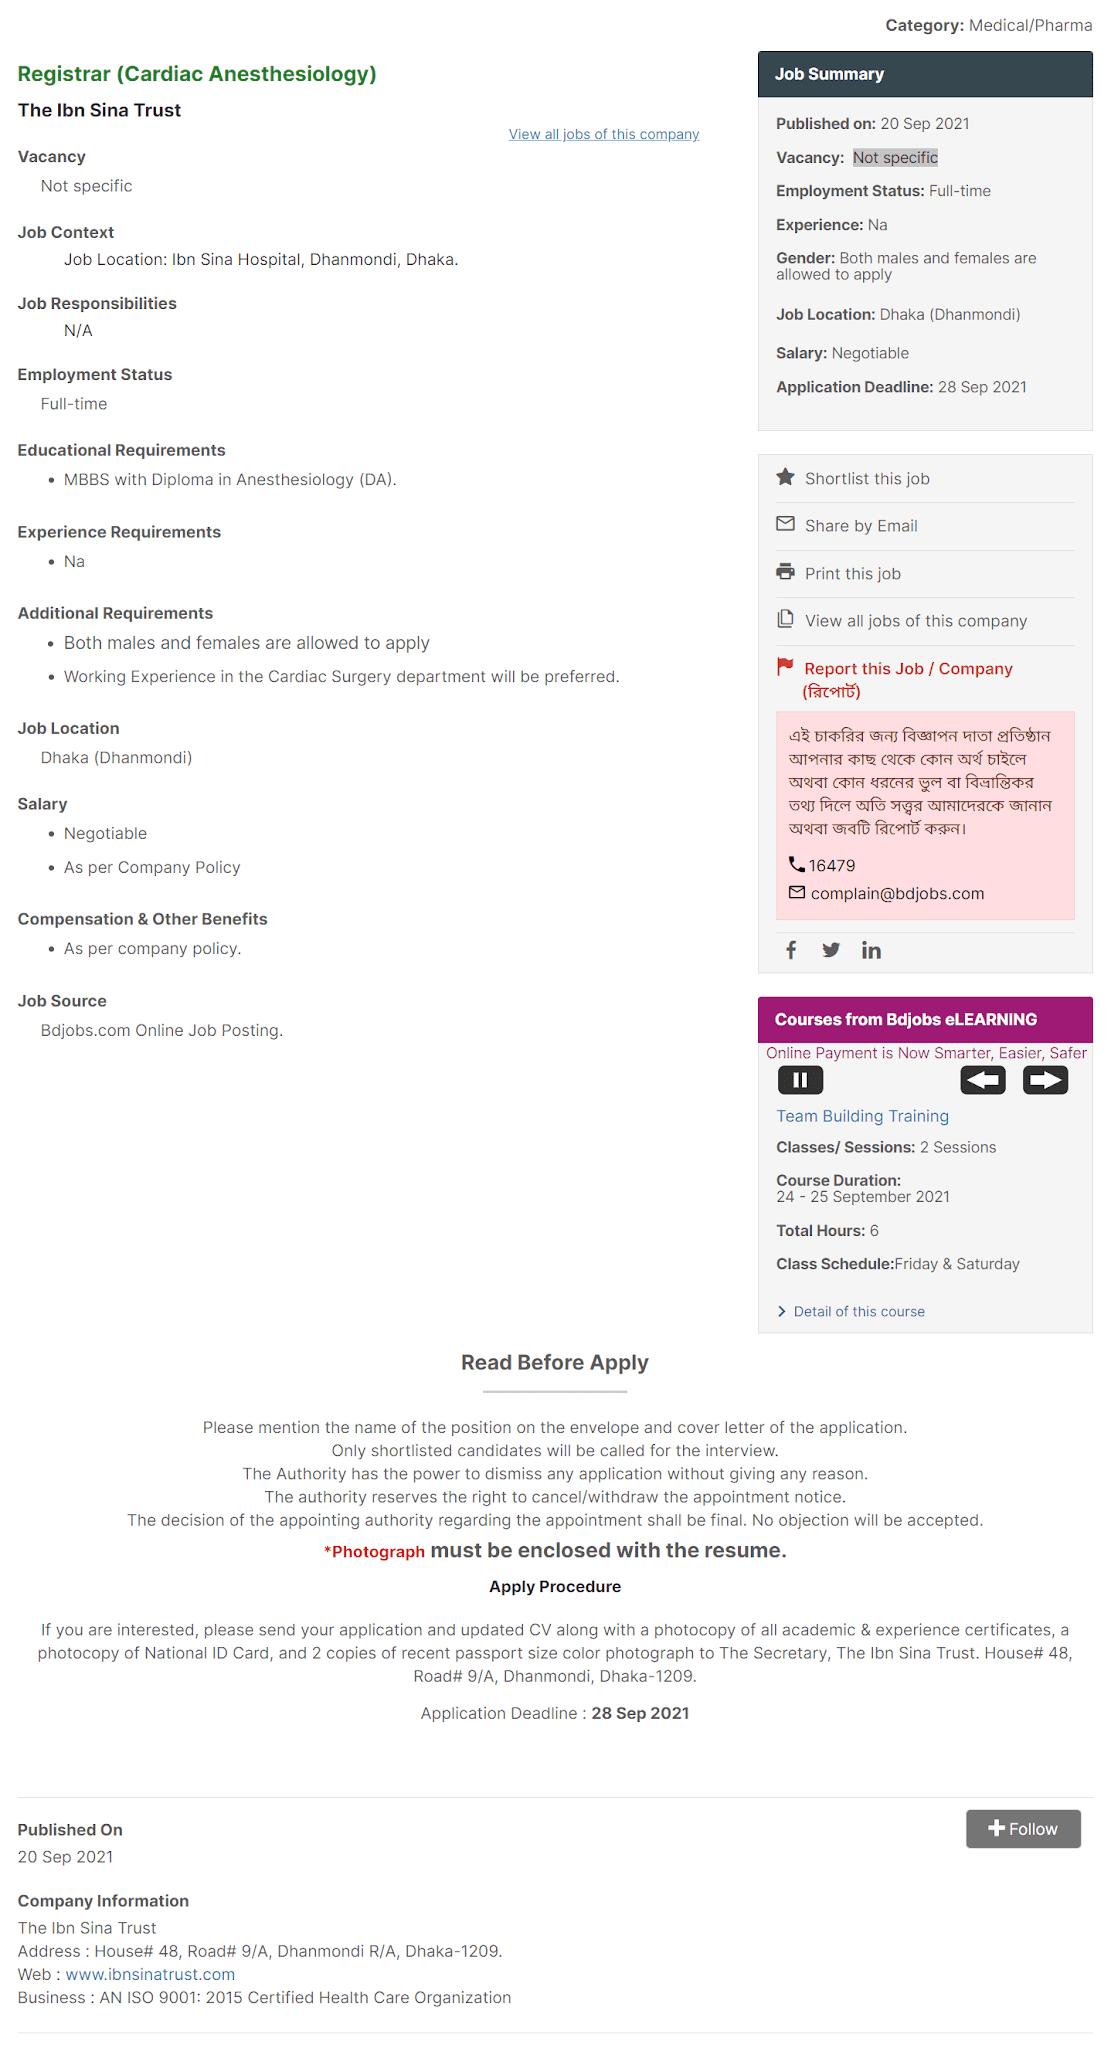 IBN Sina Trust Job Circular image 2021 Apply